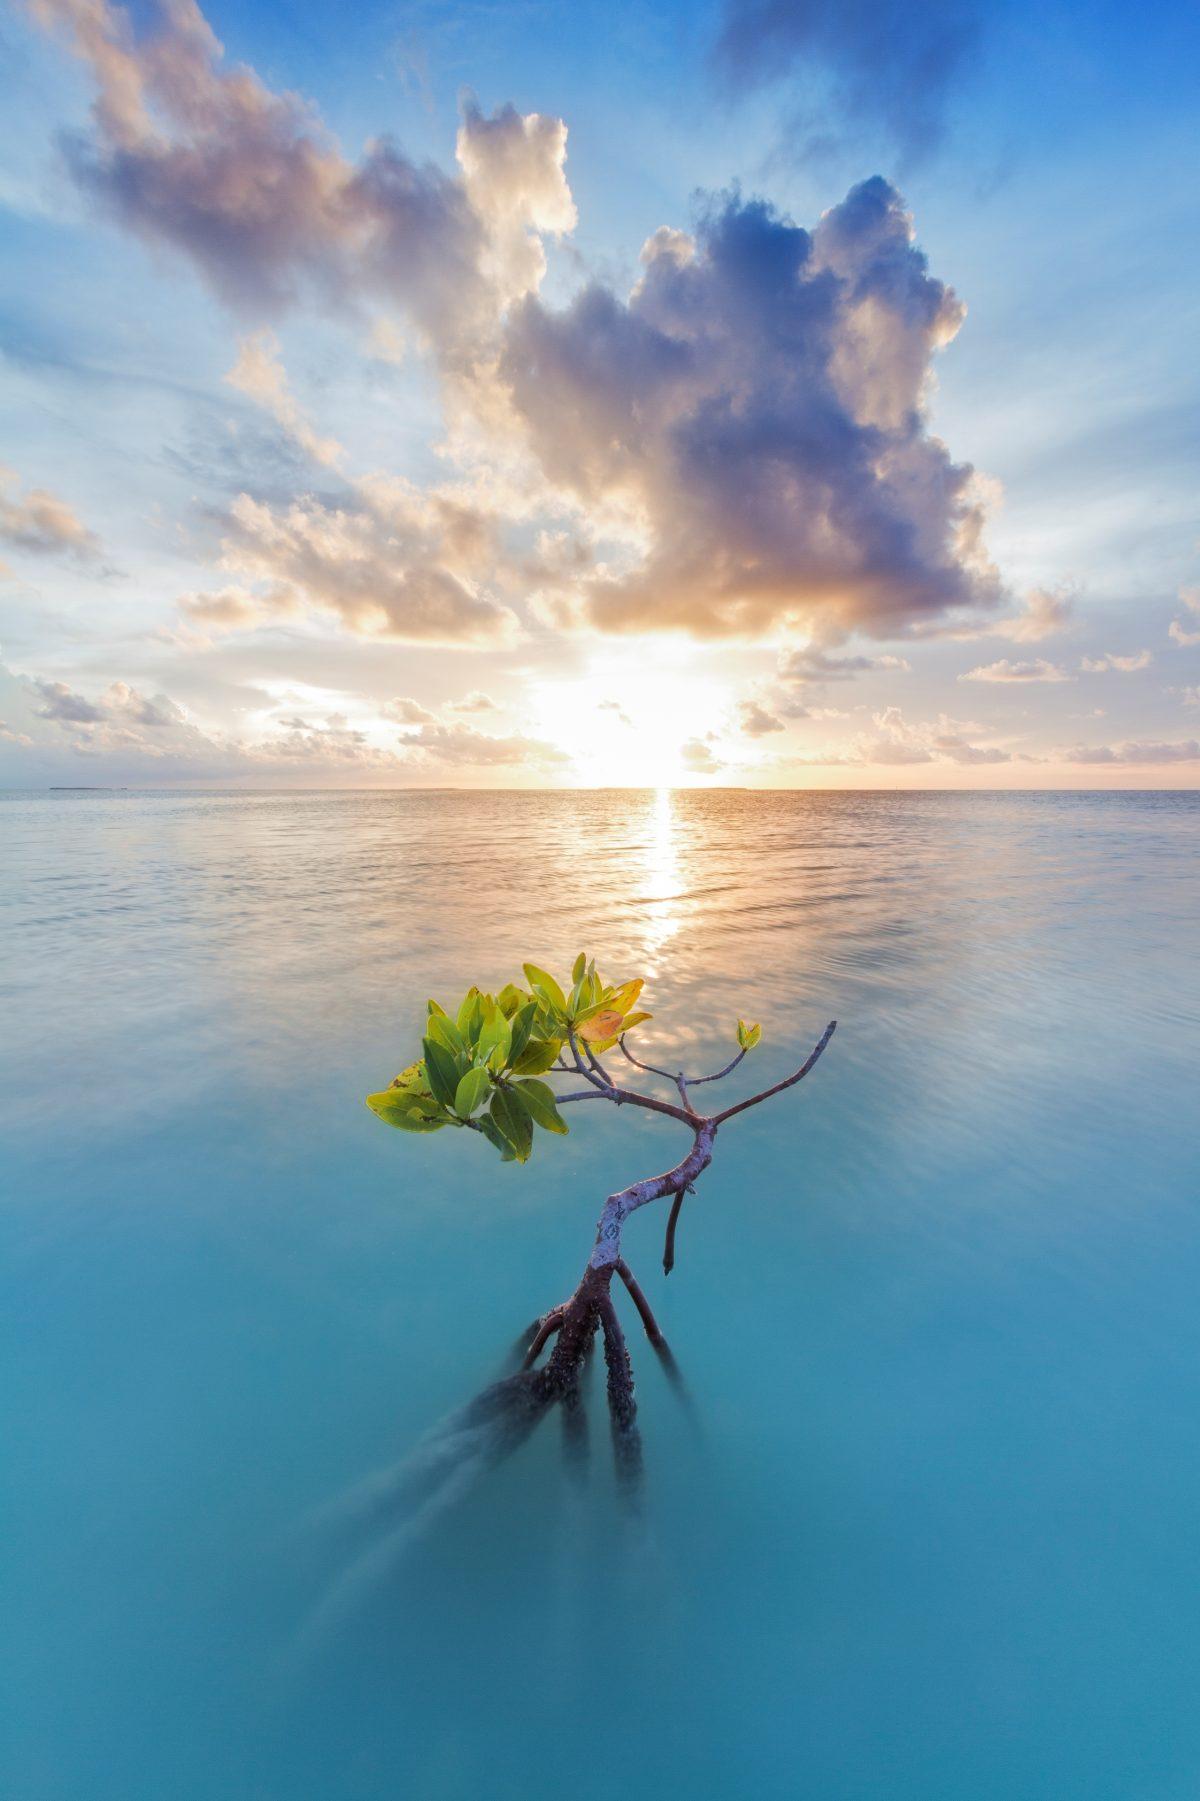 Sunset on Florida Bay in Everglades National Park.